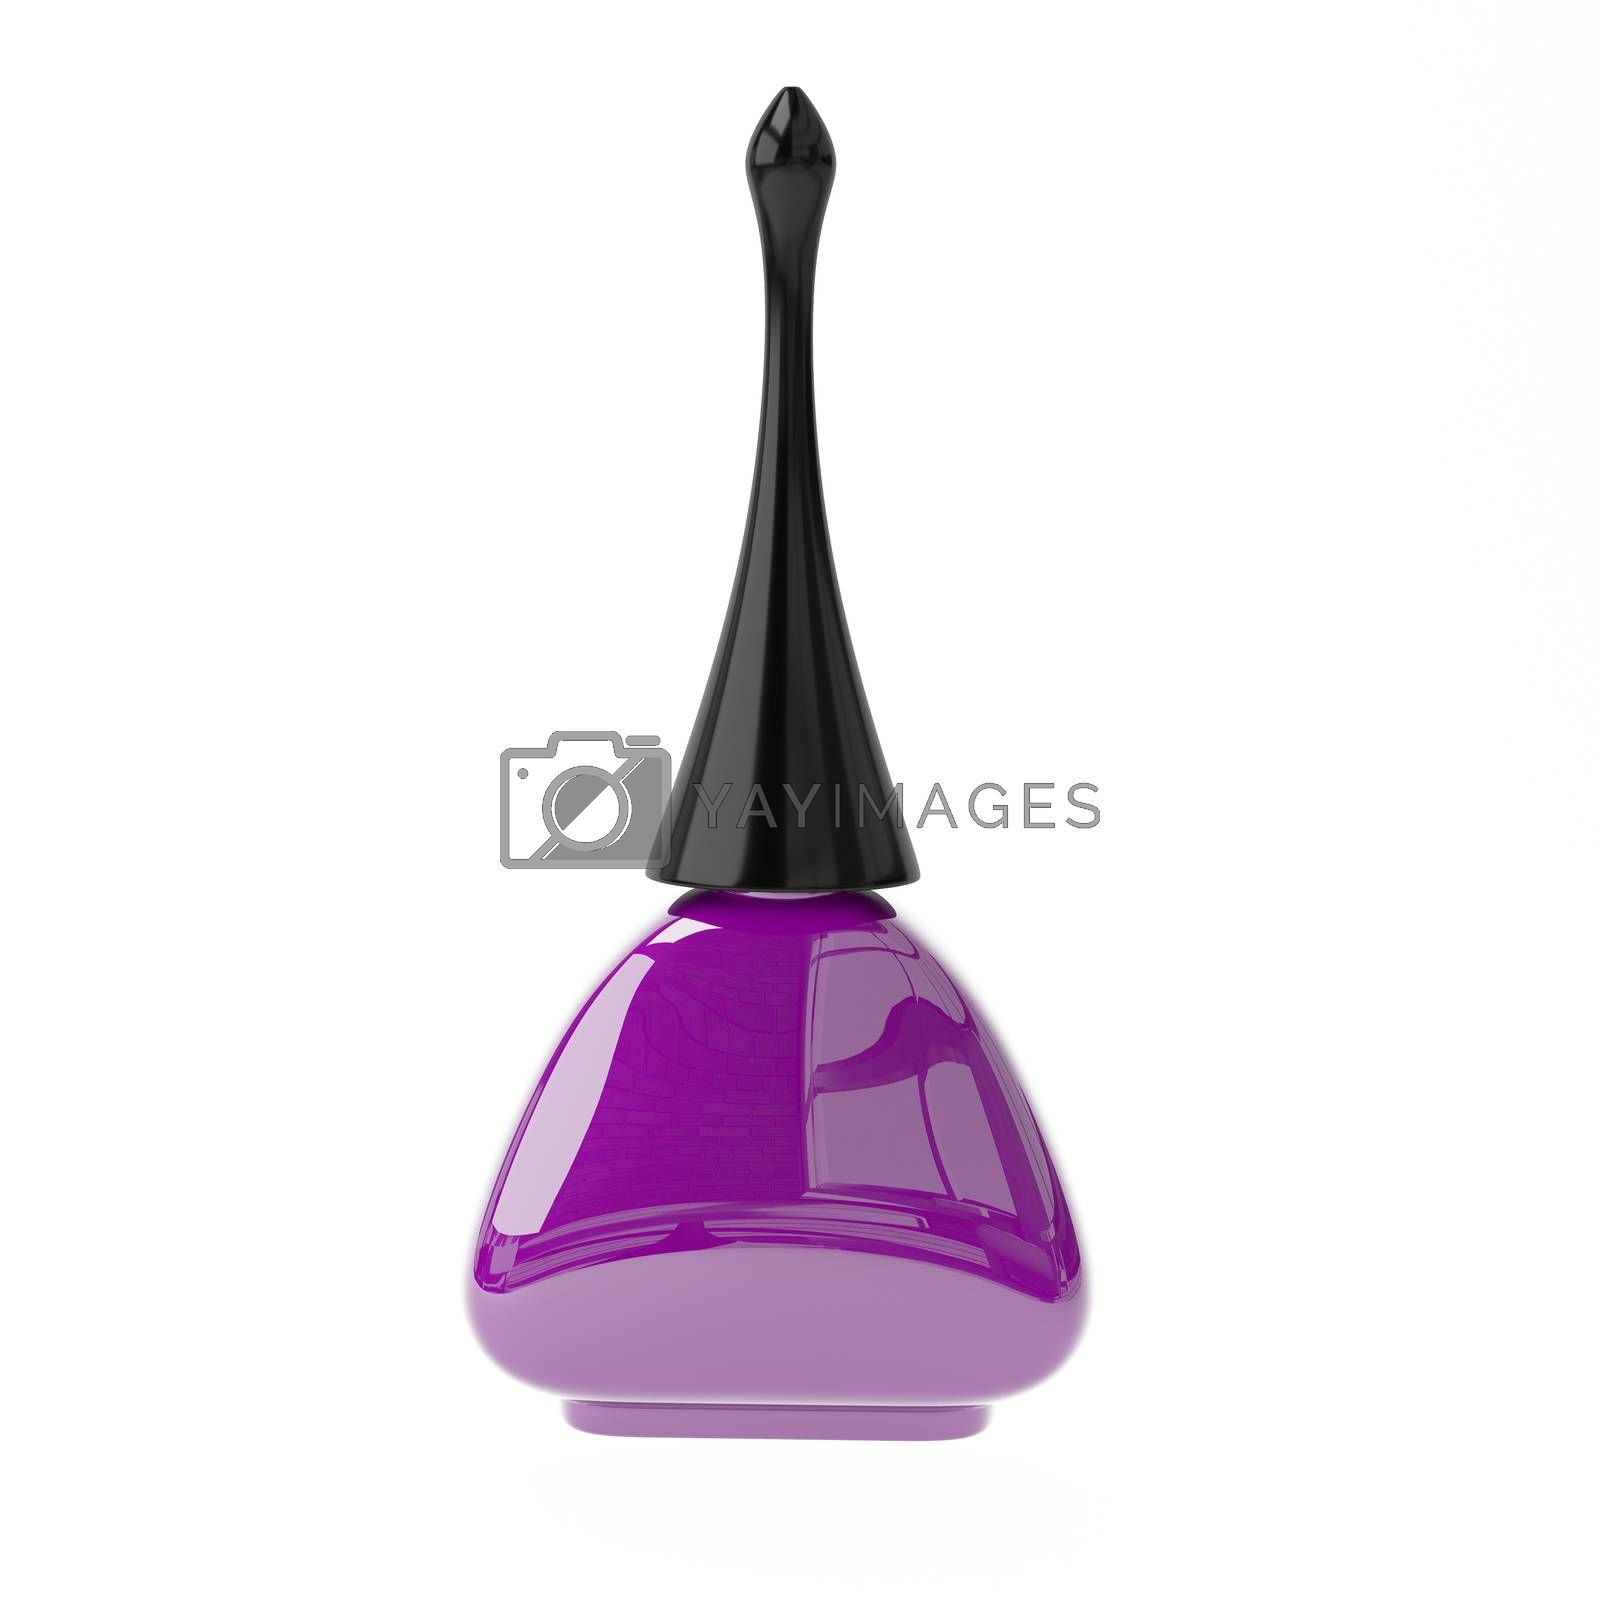 3D Illustration Purple Nail Polish on a White Background